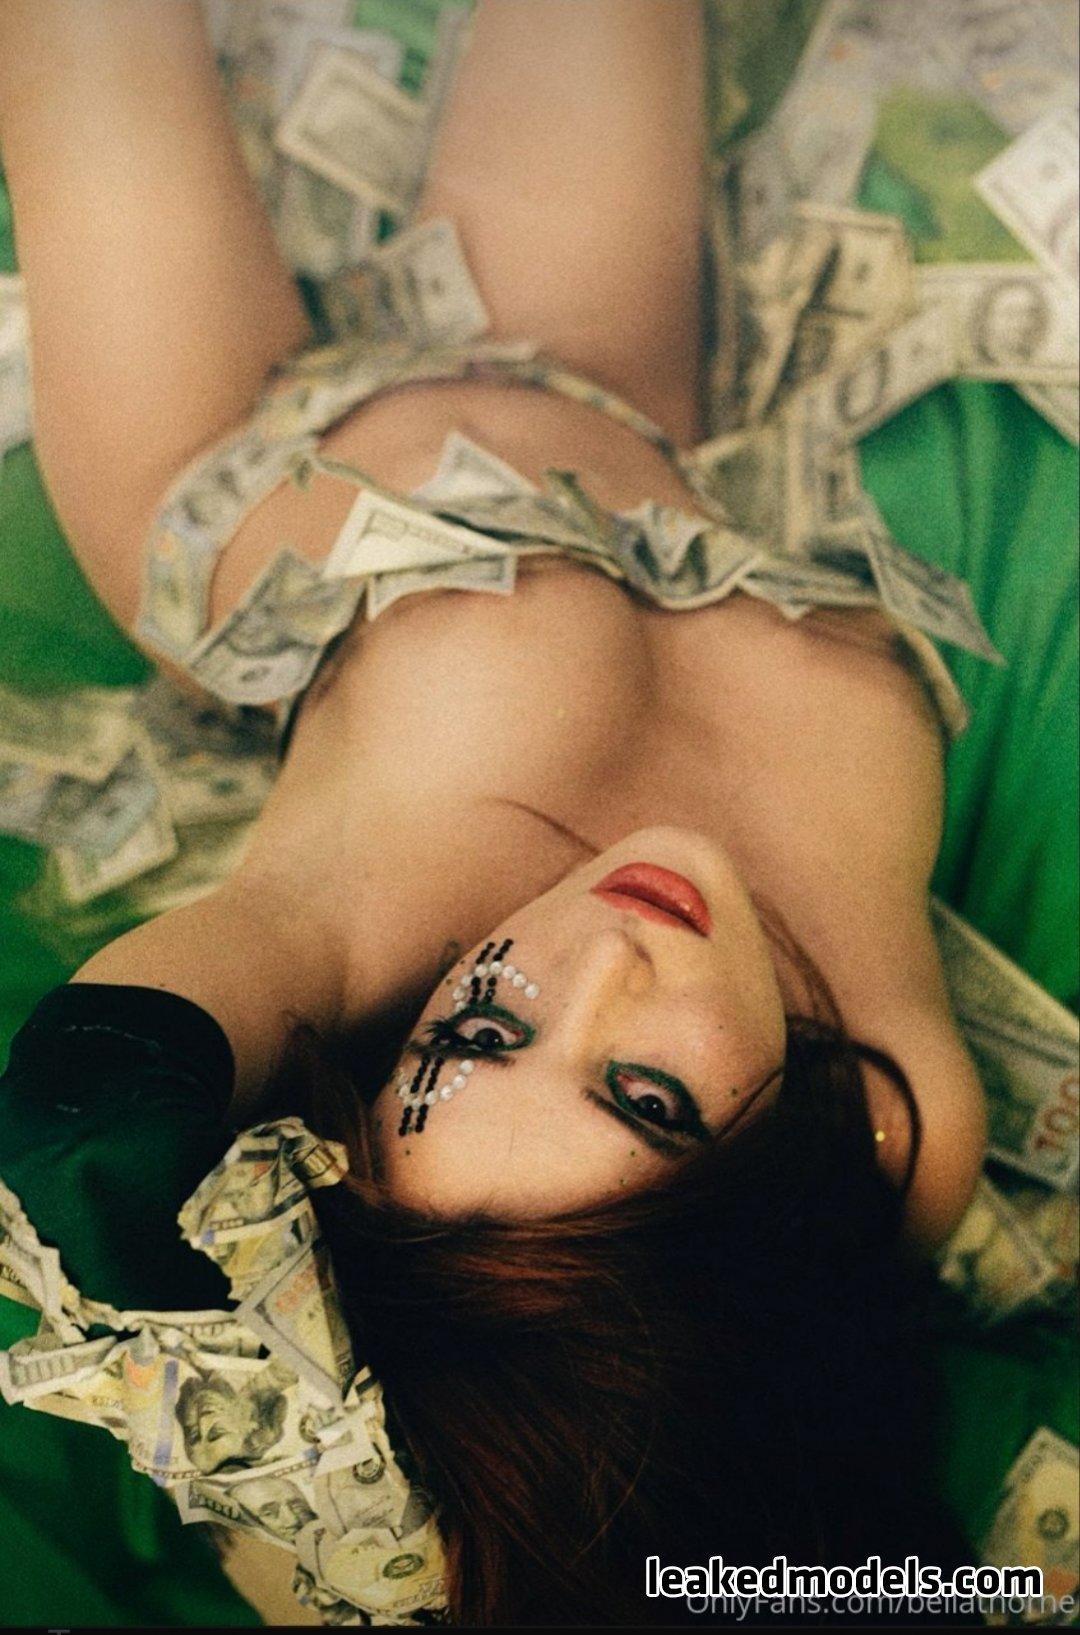 Bella Thorne – bellathorne OnlyFans Nude Leaks (27 Photos)